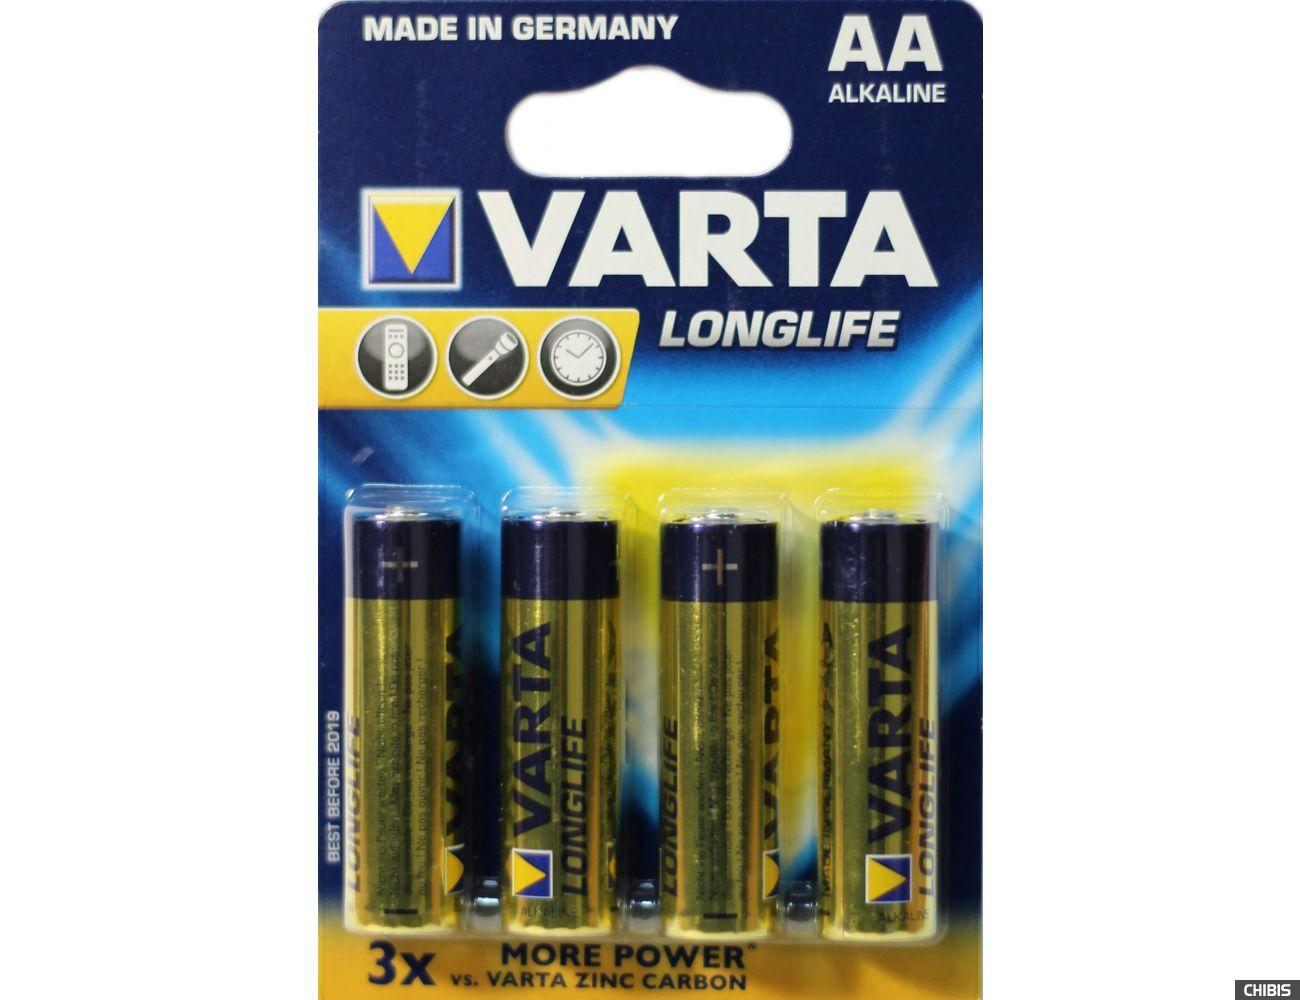 Батарейка AA Varta Longlife (LR06, 1.5V, Alkaline Щелочная) упаковка на 4 шт